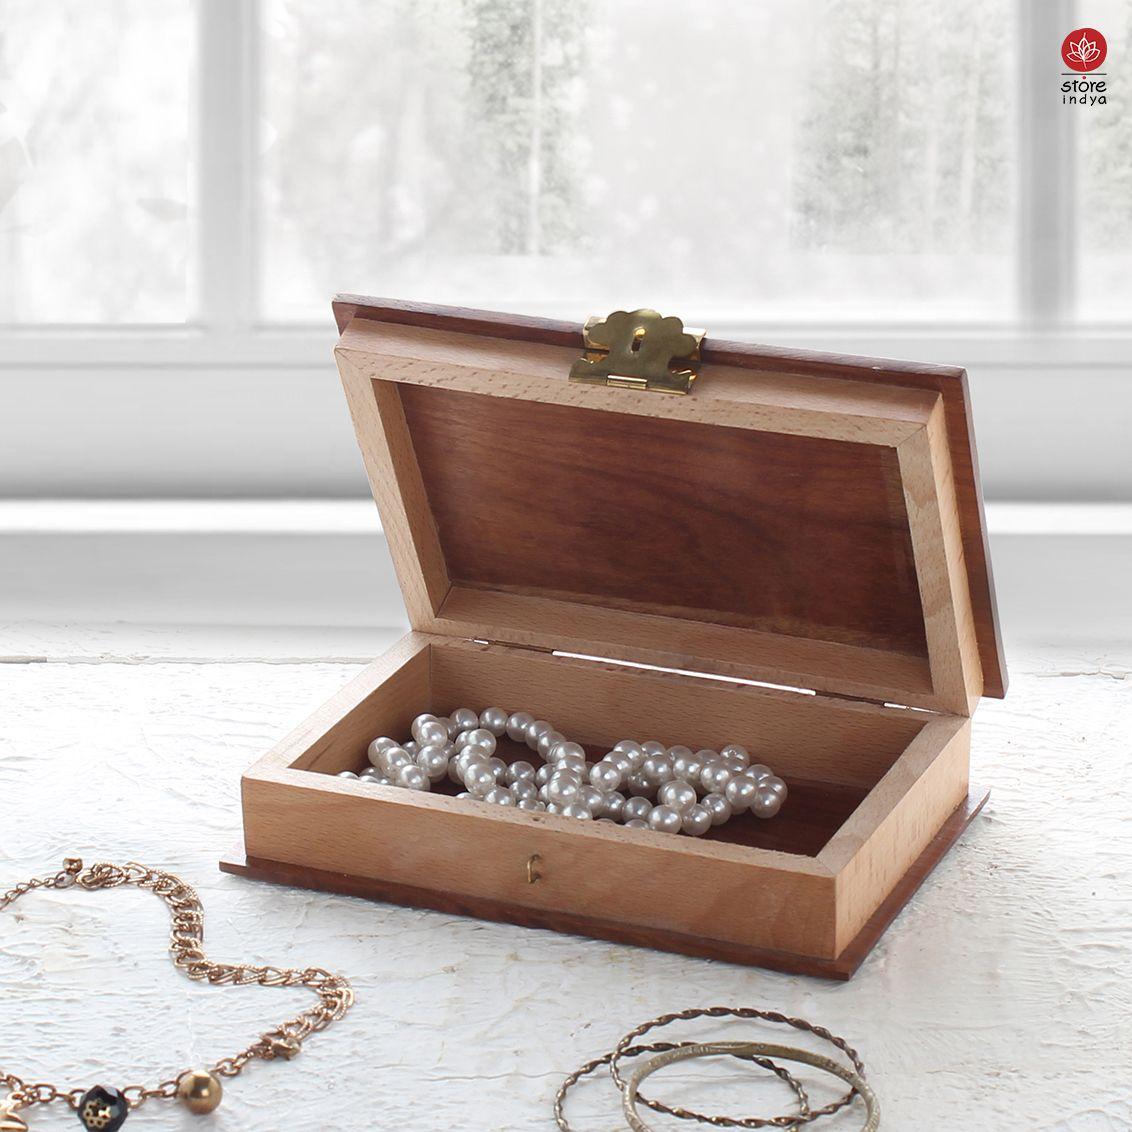 Amazon Ca Store Indya Handcrafted Wooden Book Jewellery Storage Keepsake Trinket Box With Brass Latch Wooden Jewelry Wooden Jewelry Boxes Book Jewelry